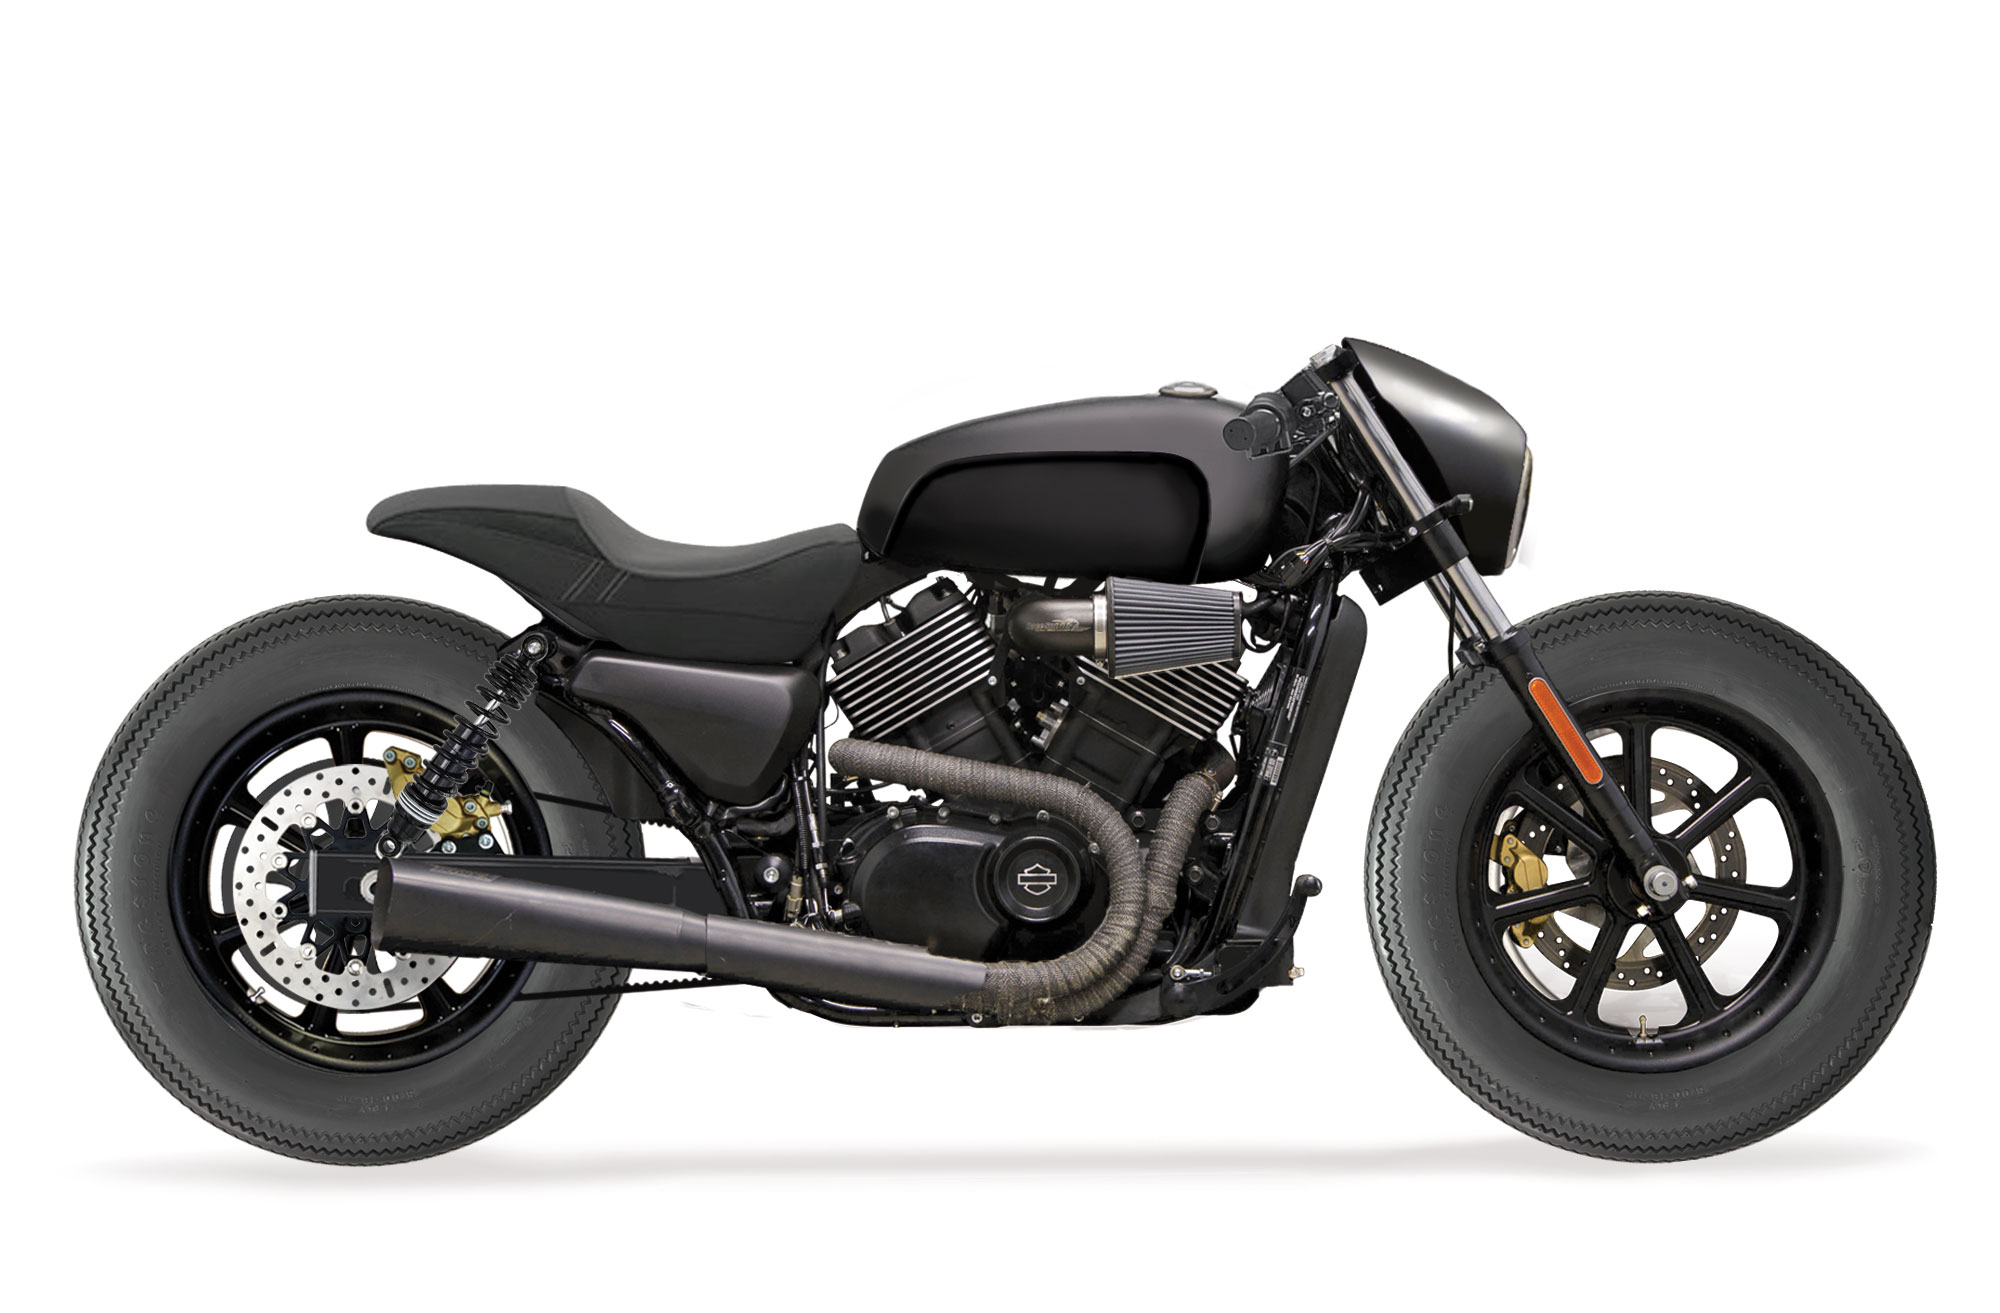 Harley-Davidson-Street-750-5.jpg